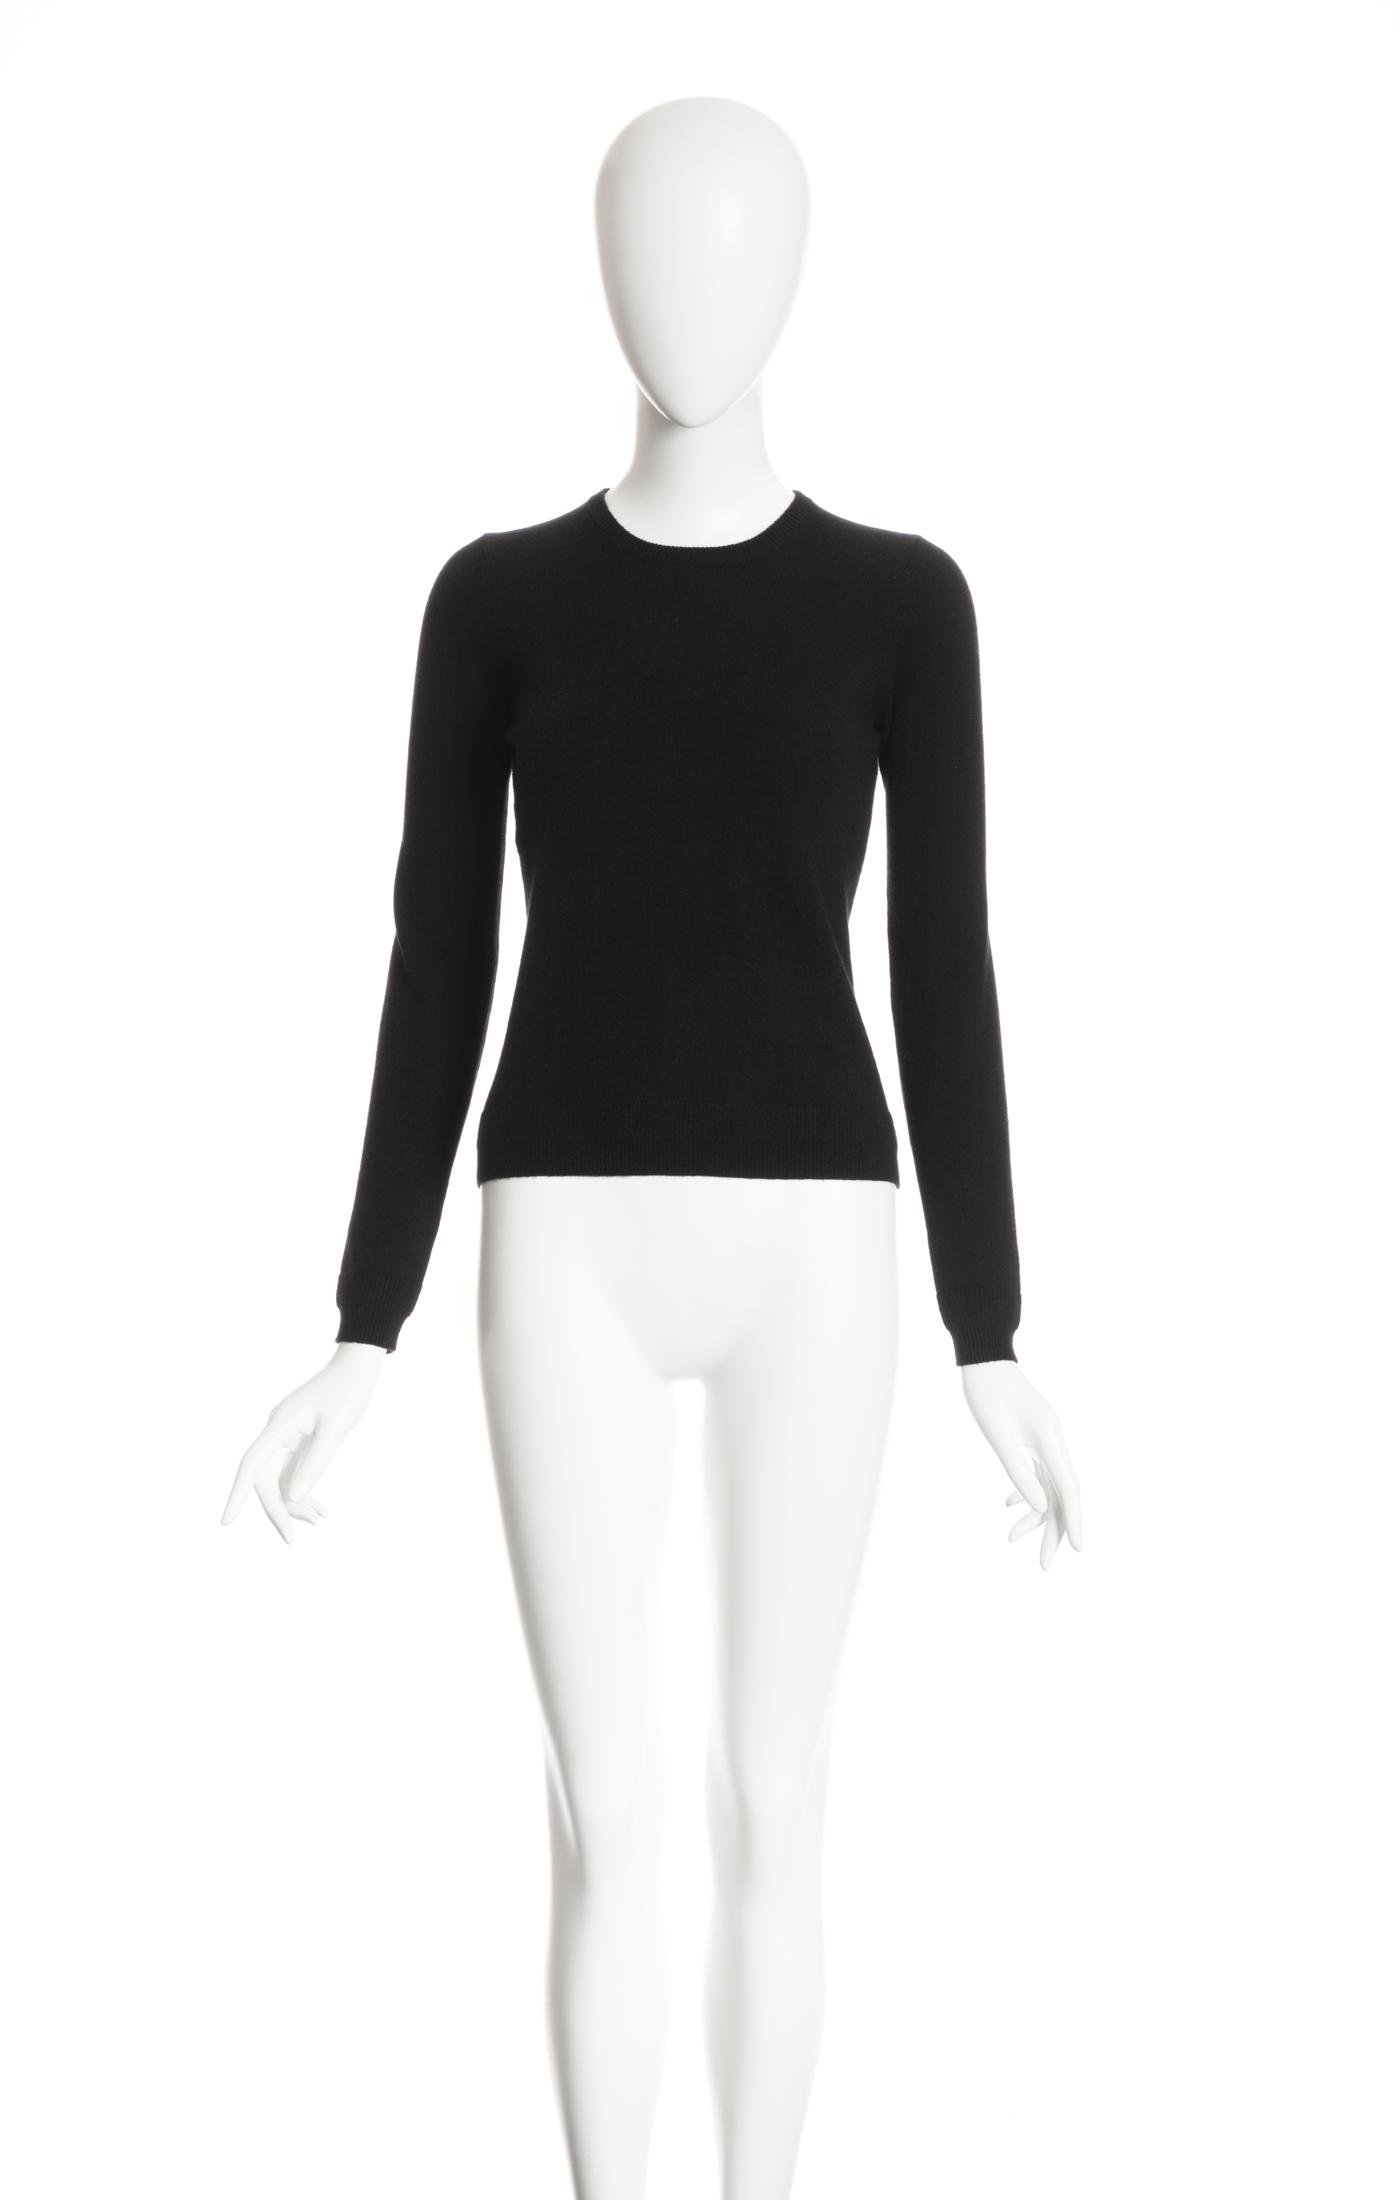 MARGARITA-F15-NOIR-cavadesoi-knitwear-4798.jpg